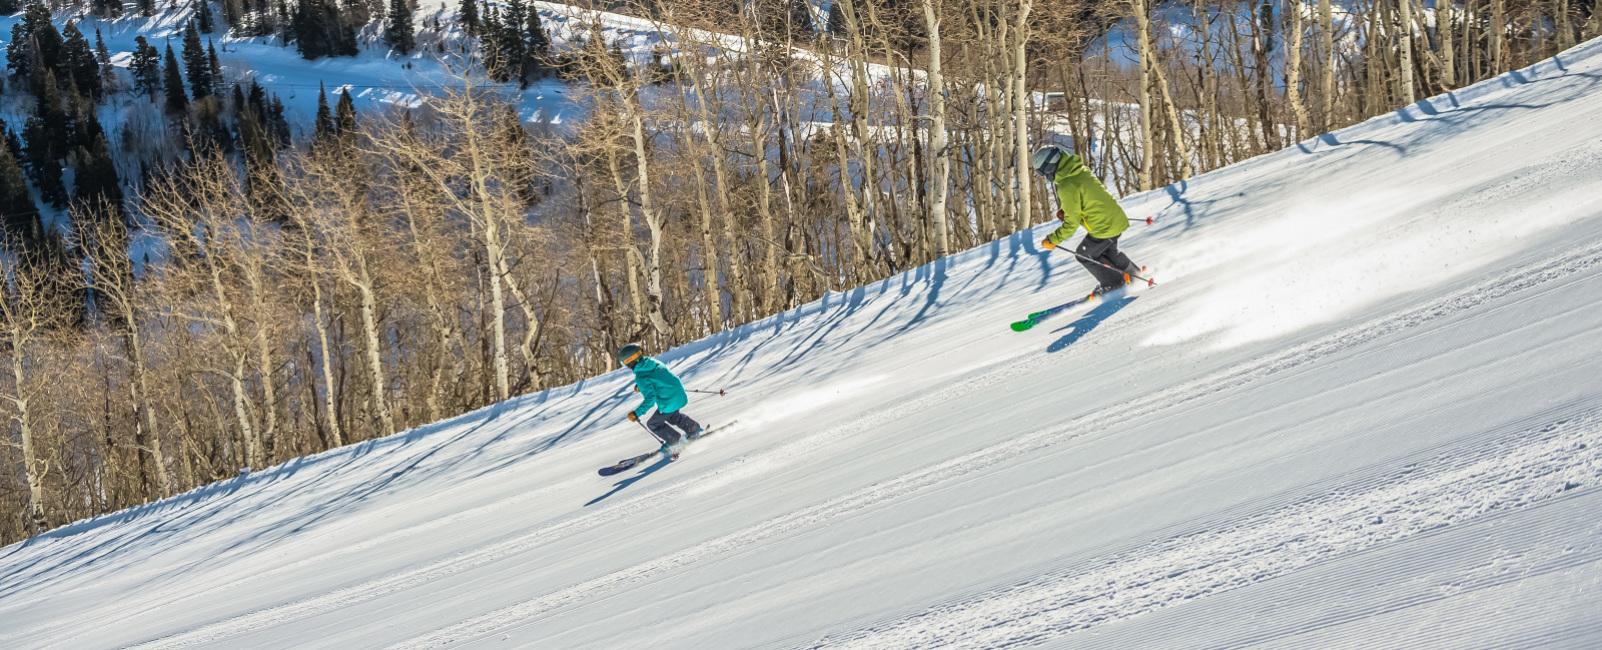 The Ski Utah Passport + Yeti Pass Is the Best Deal For Skiing Families